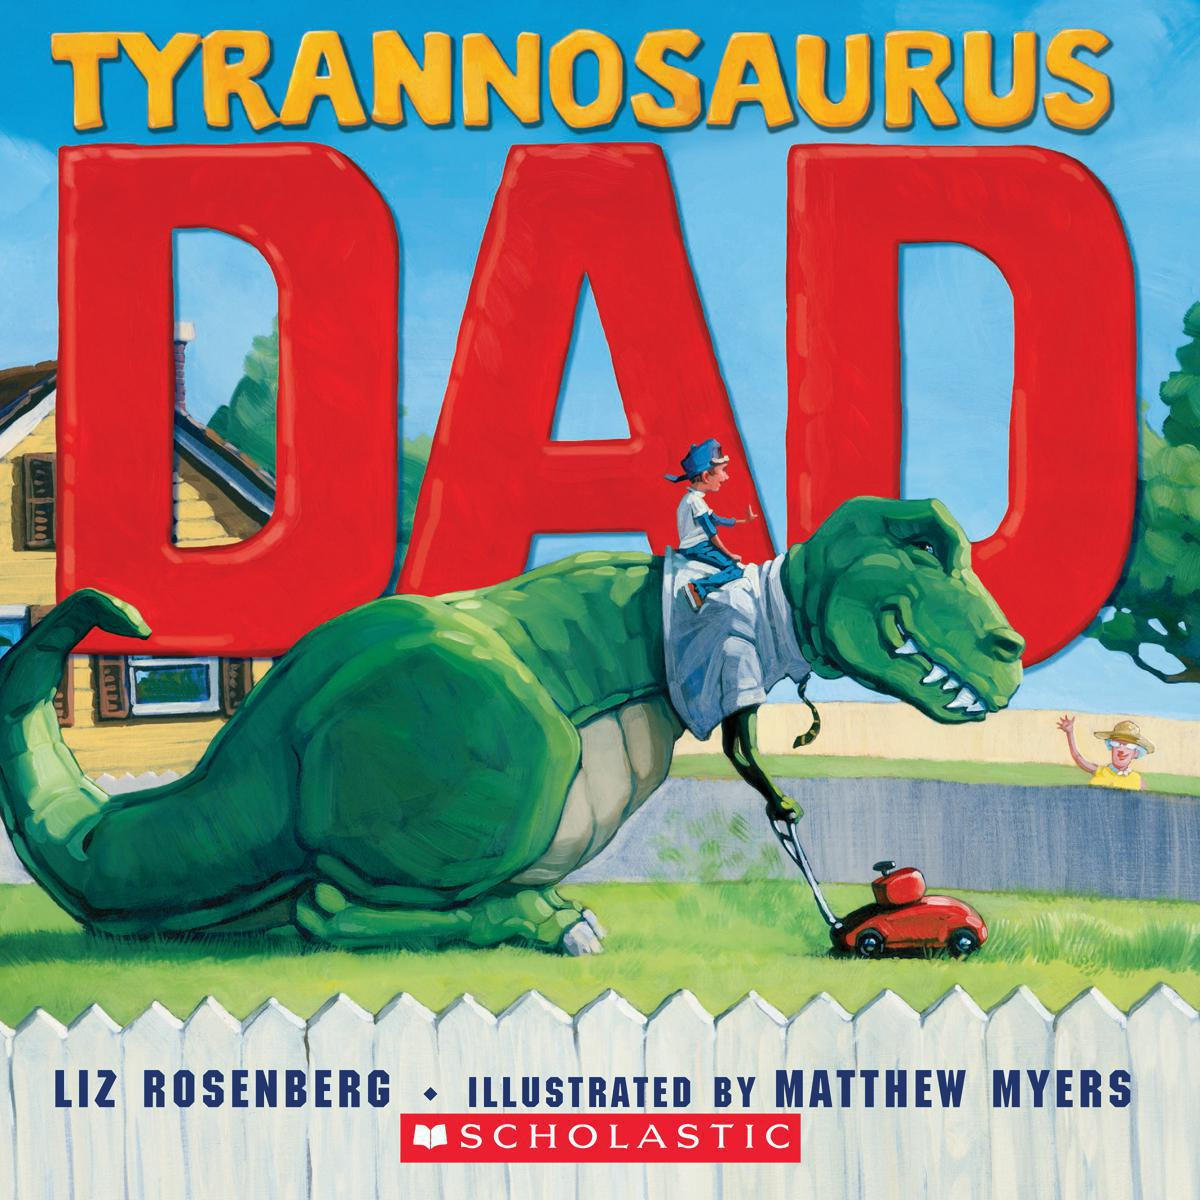 Tyrannosaurus Dad